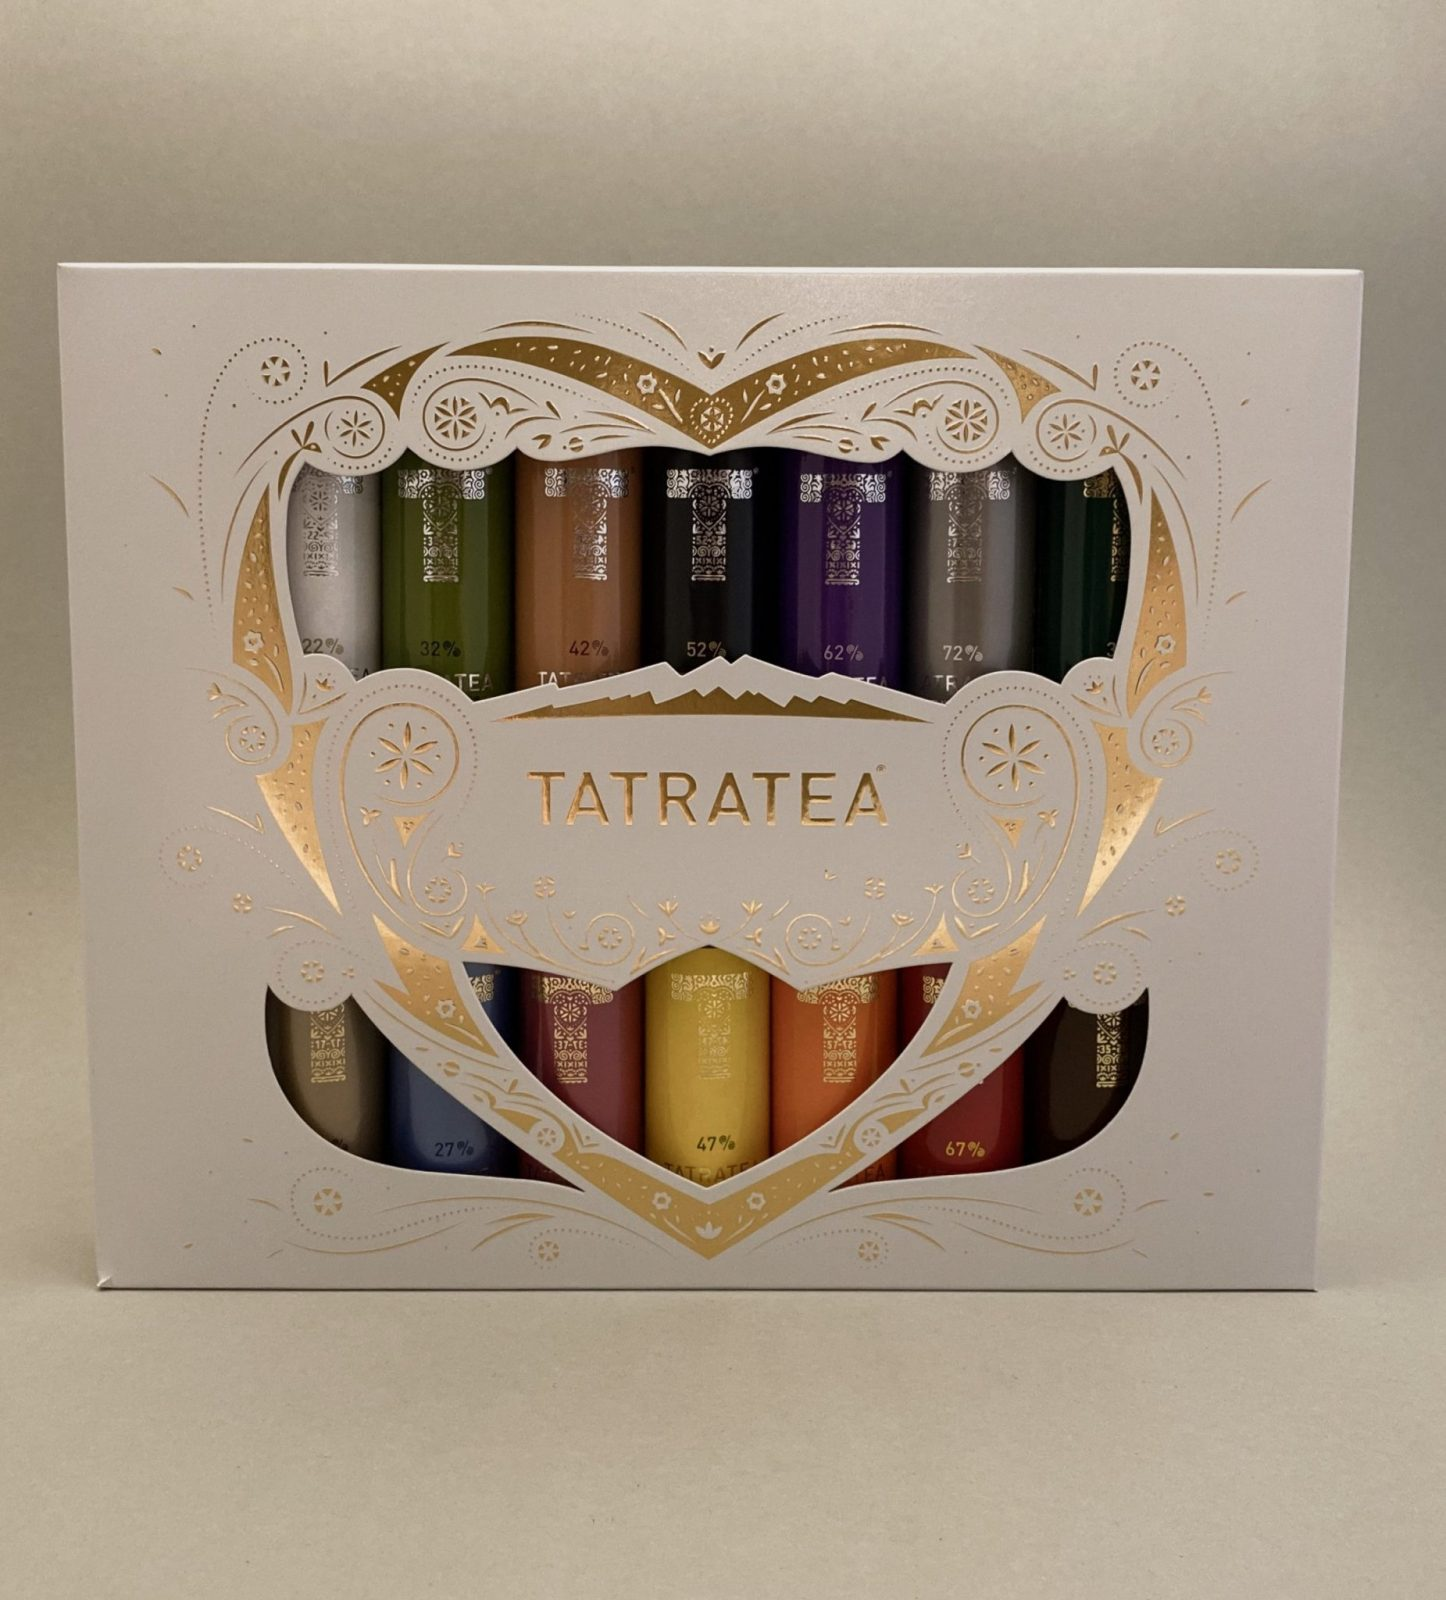 TATRATEA Mini Set 17 72% 14ks, Bottleshop Sunny wines slnecnice mesto, petrzalka, Tatratea, rozvoz alkoholu, eshop